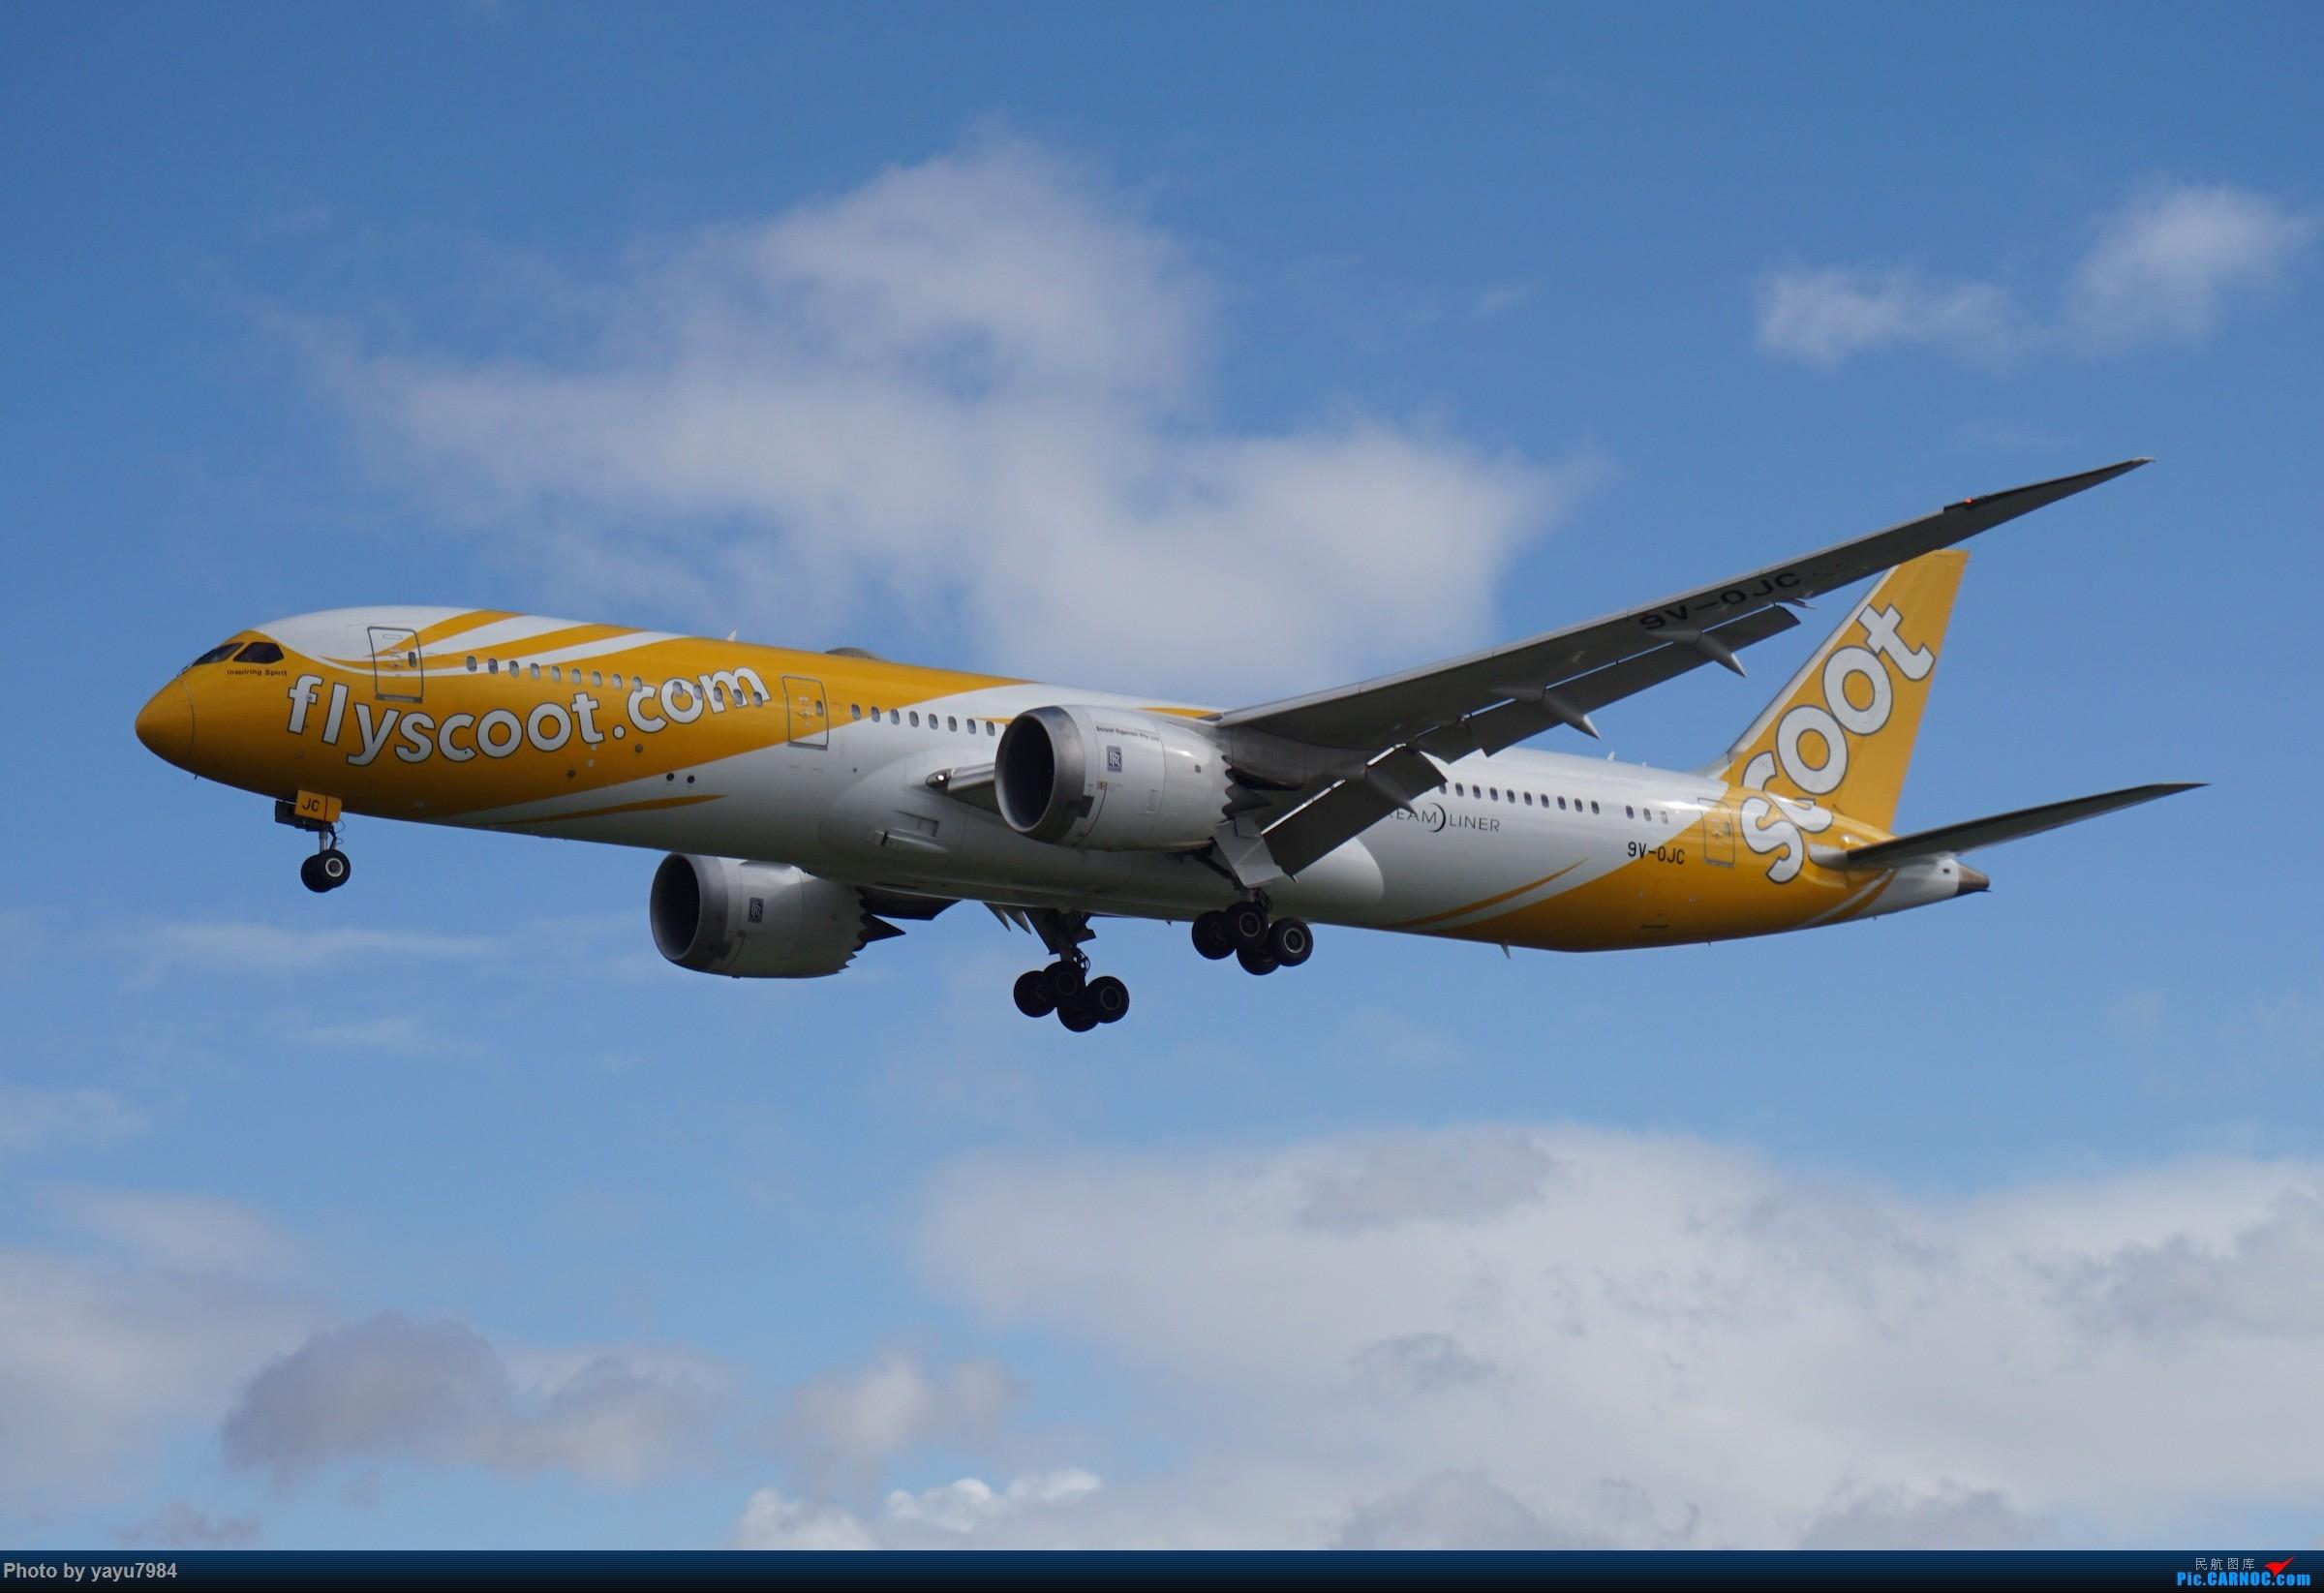 Re:[原创][SYD] 近期随摄,收获颇多 BOEING 787-9 9V-OJC 澳大利亚悉尼金斯福德·史密斯机场